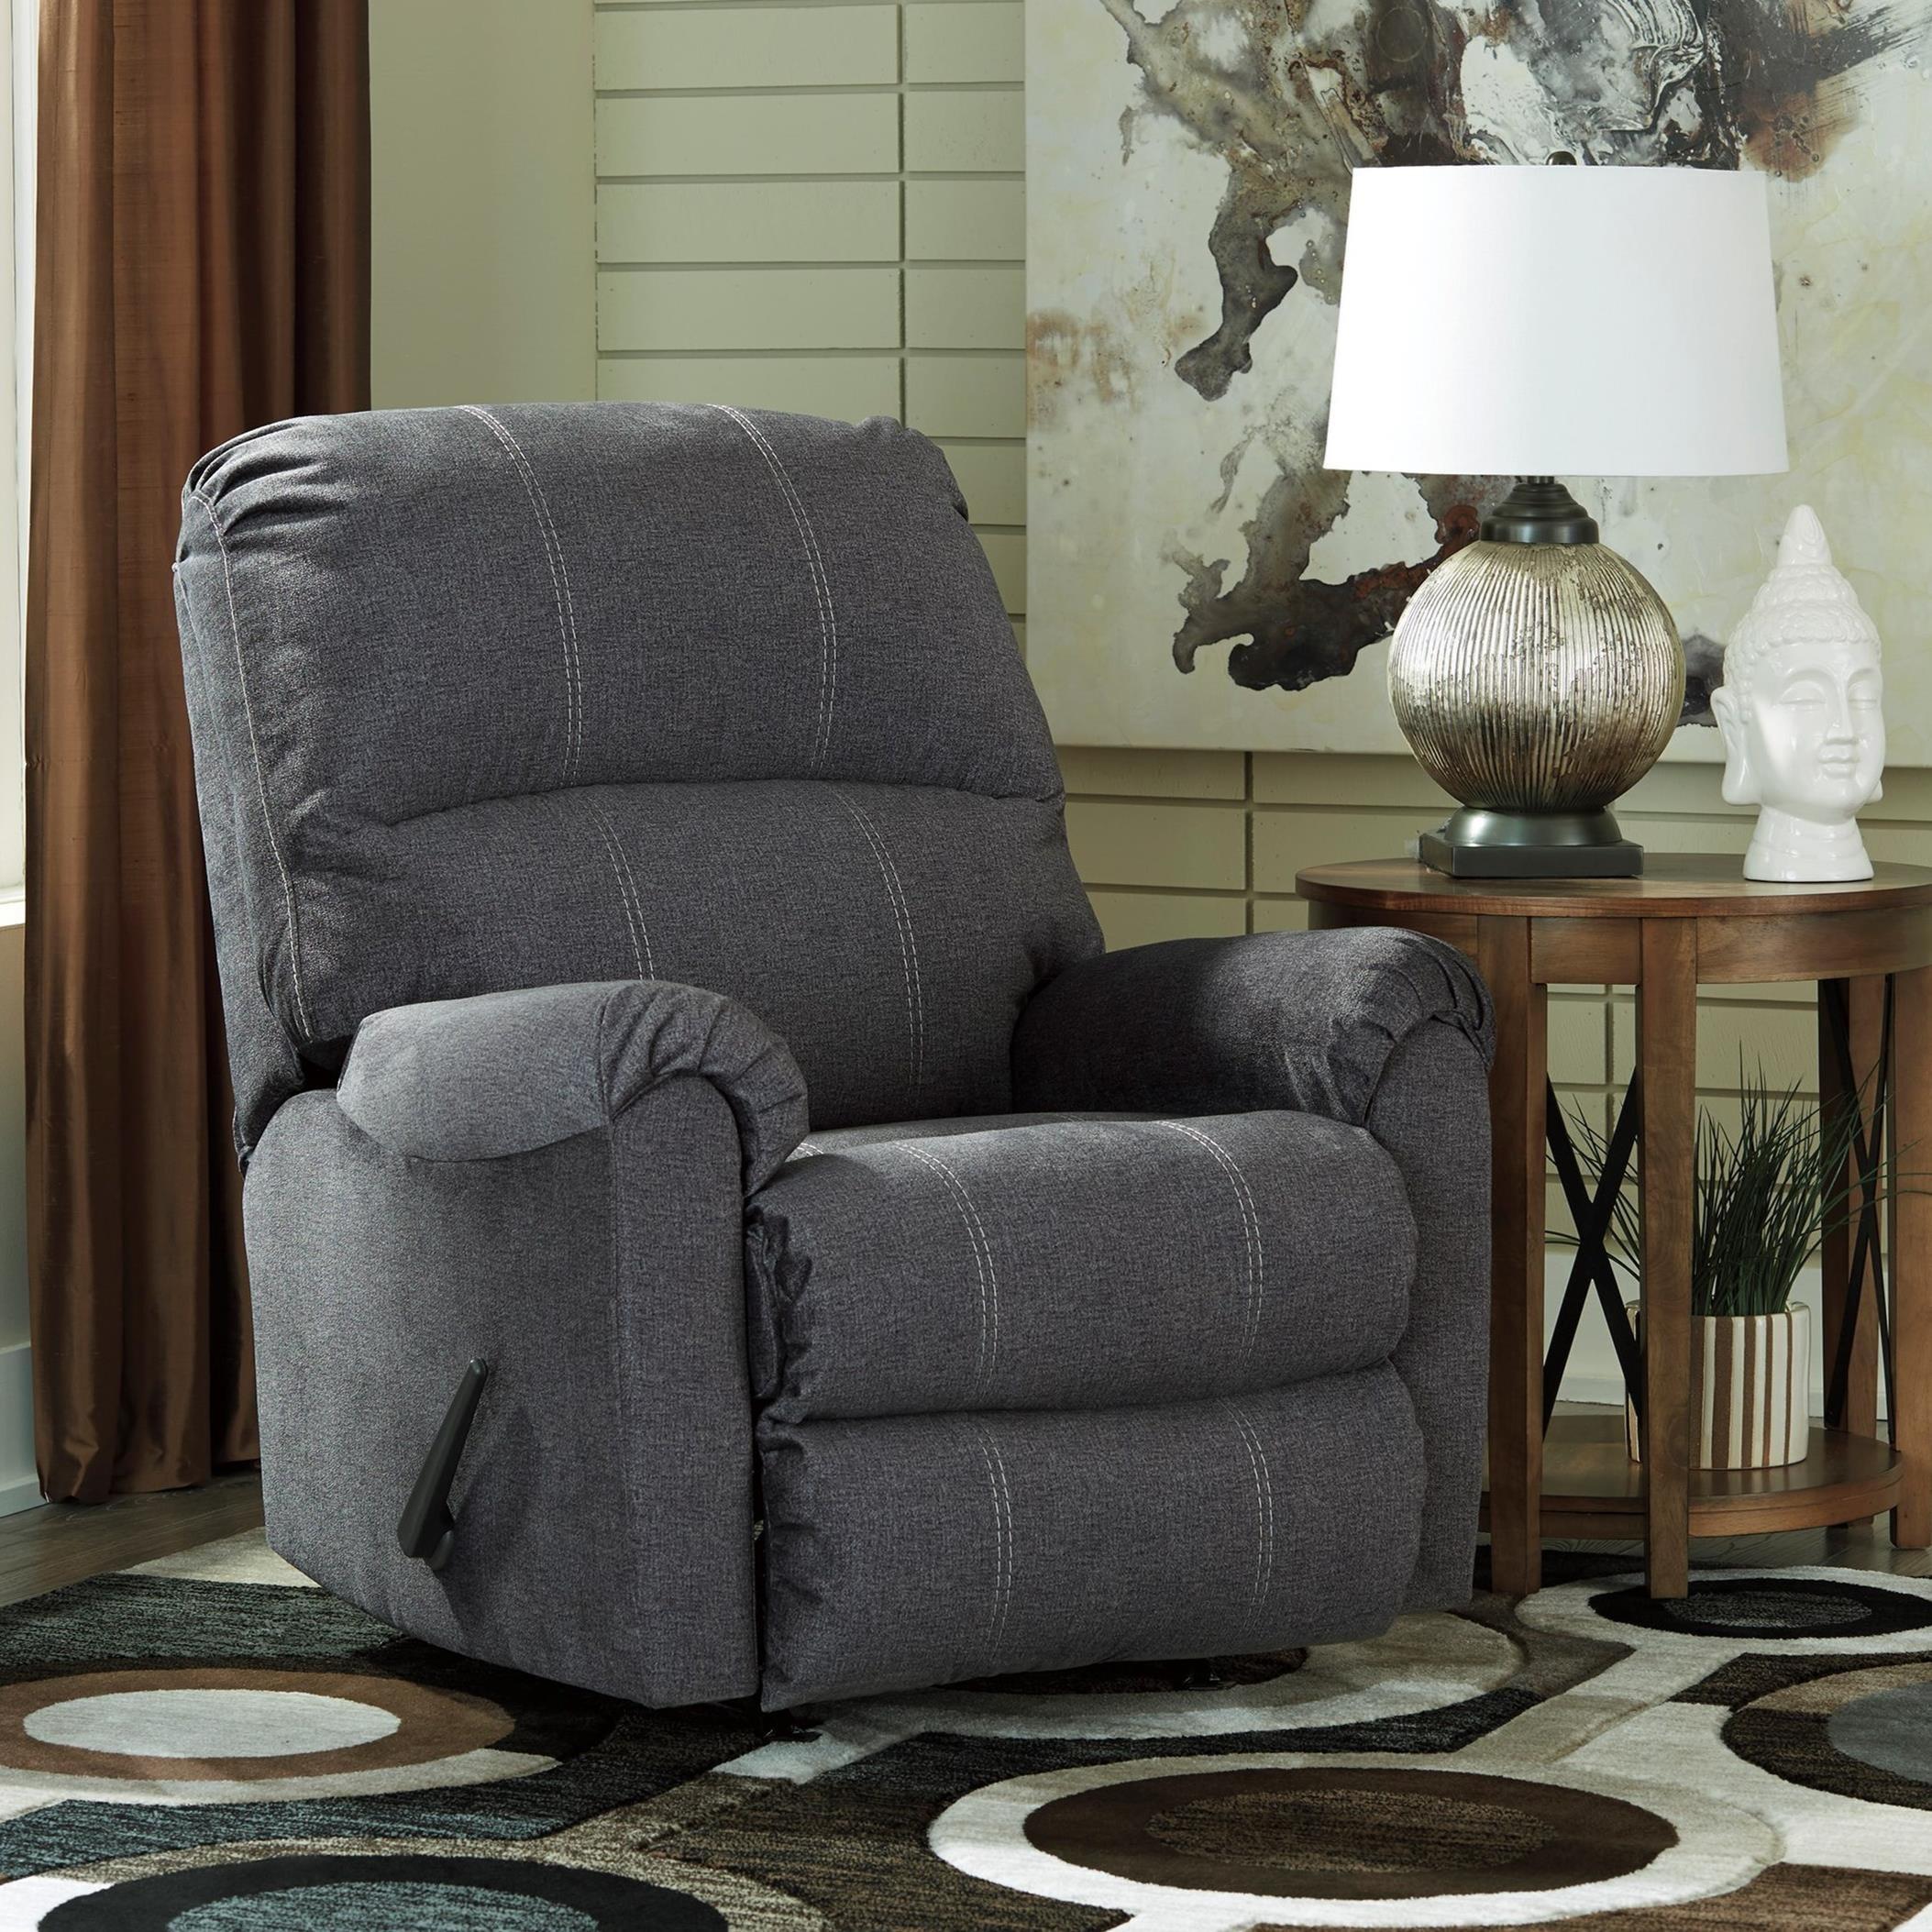 Ashley Furniture Superstore